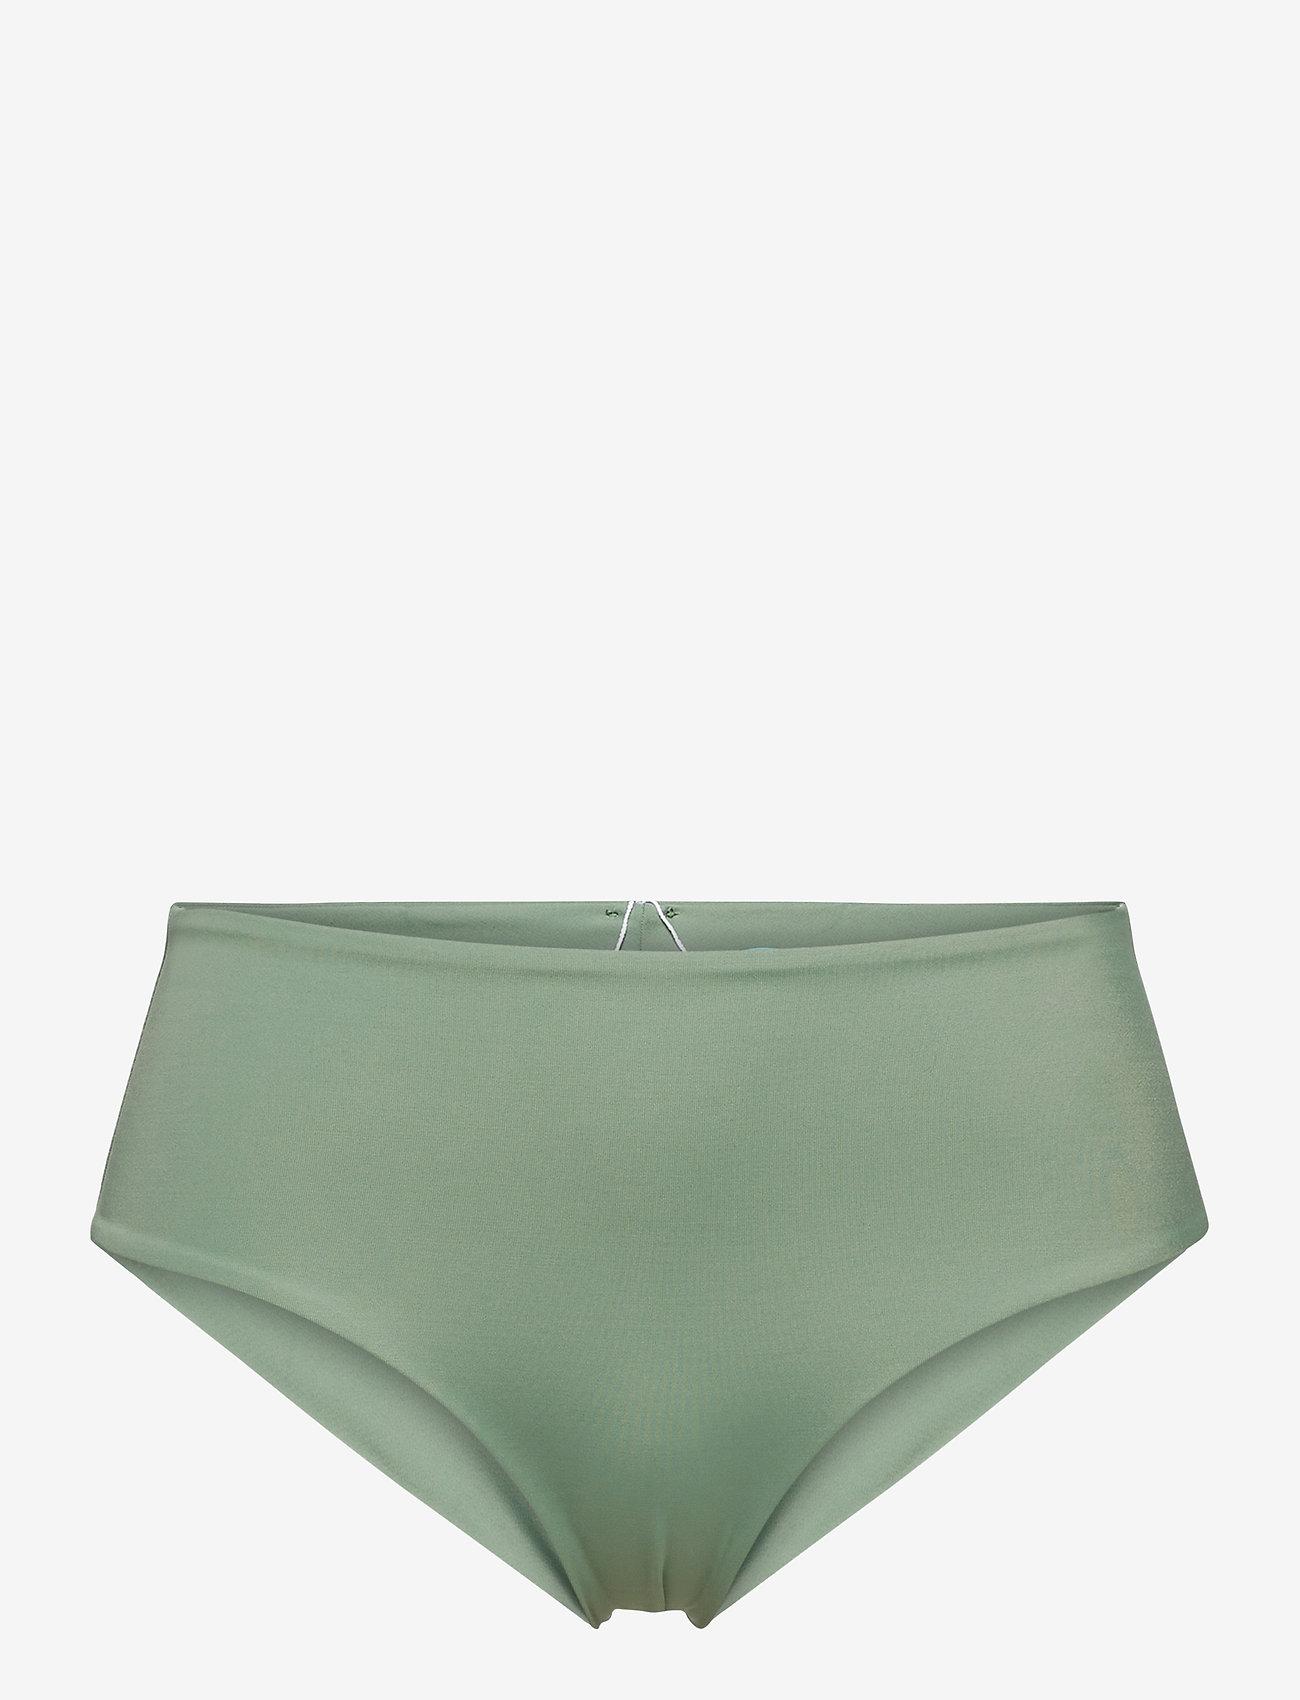 O'neill - PW MALTA BOTTOM - majtki bikini - lily pad - 0